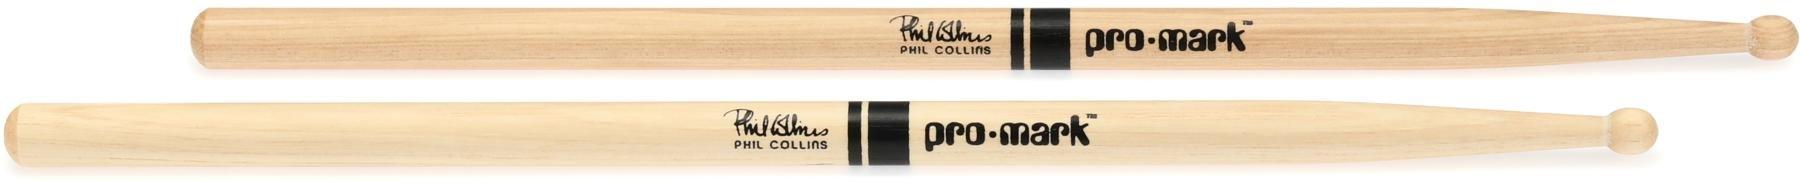 Matt Halpern Signature Stick Drum Sticks Promark Artist Series American Hickory